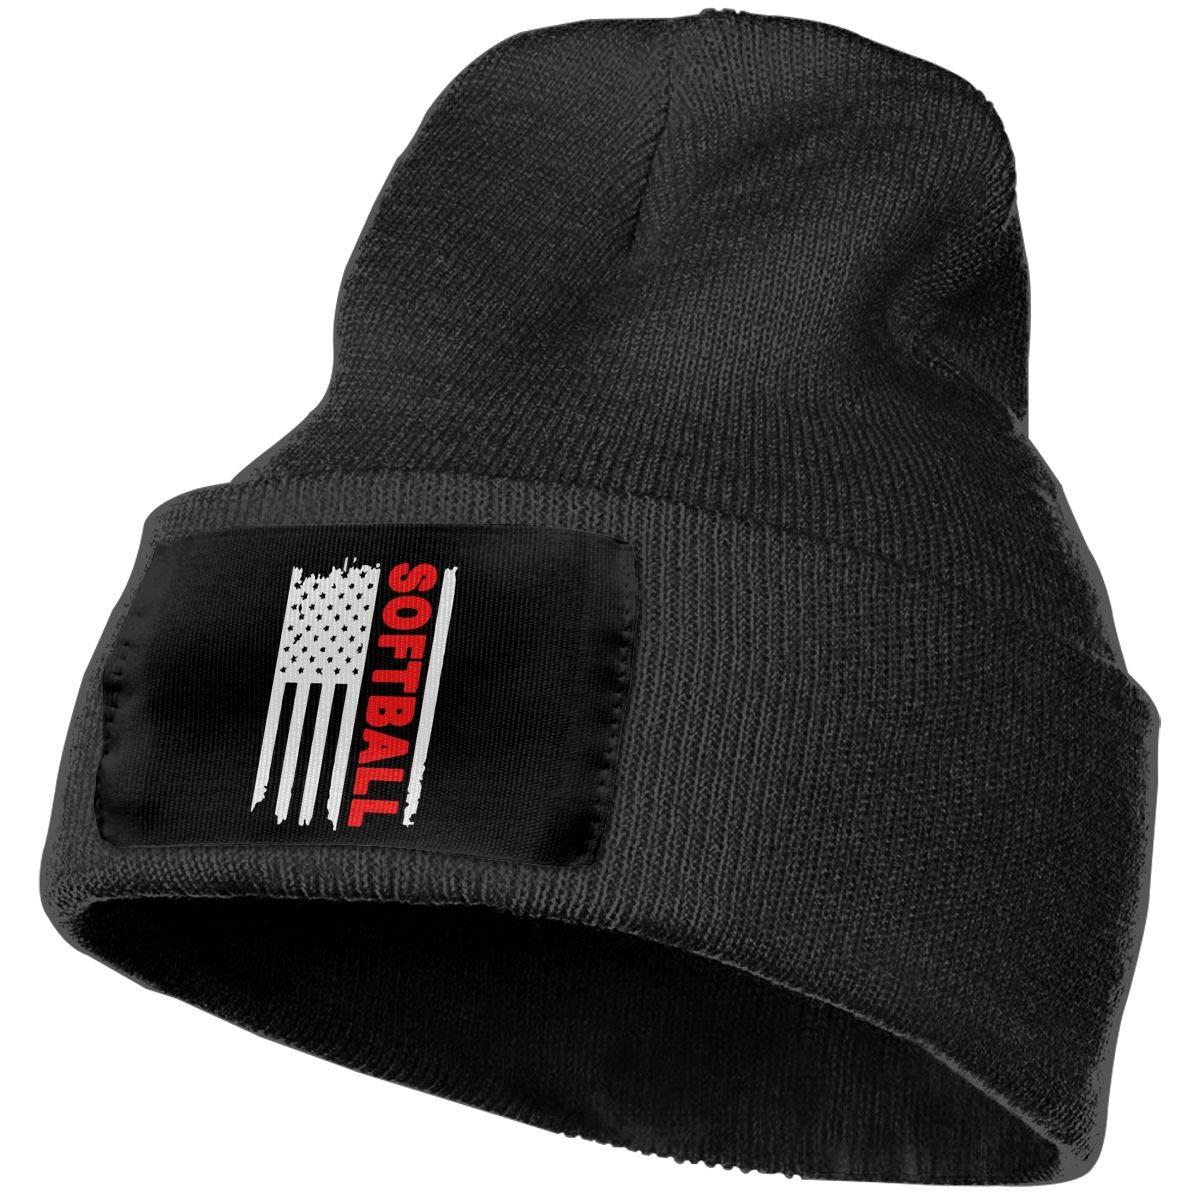 COLLJL-8 Men//Women Softball Flag Outdoor Stretch Knit Beanies Hat Soft Winter Skull Caps